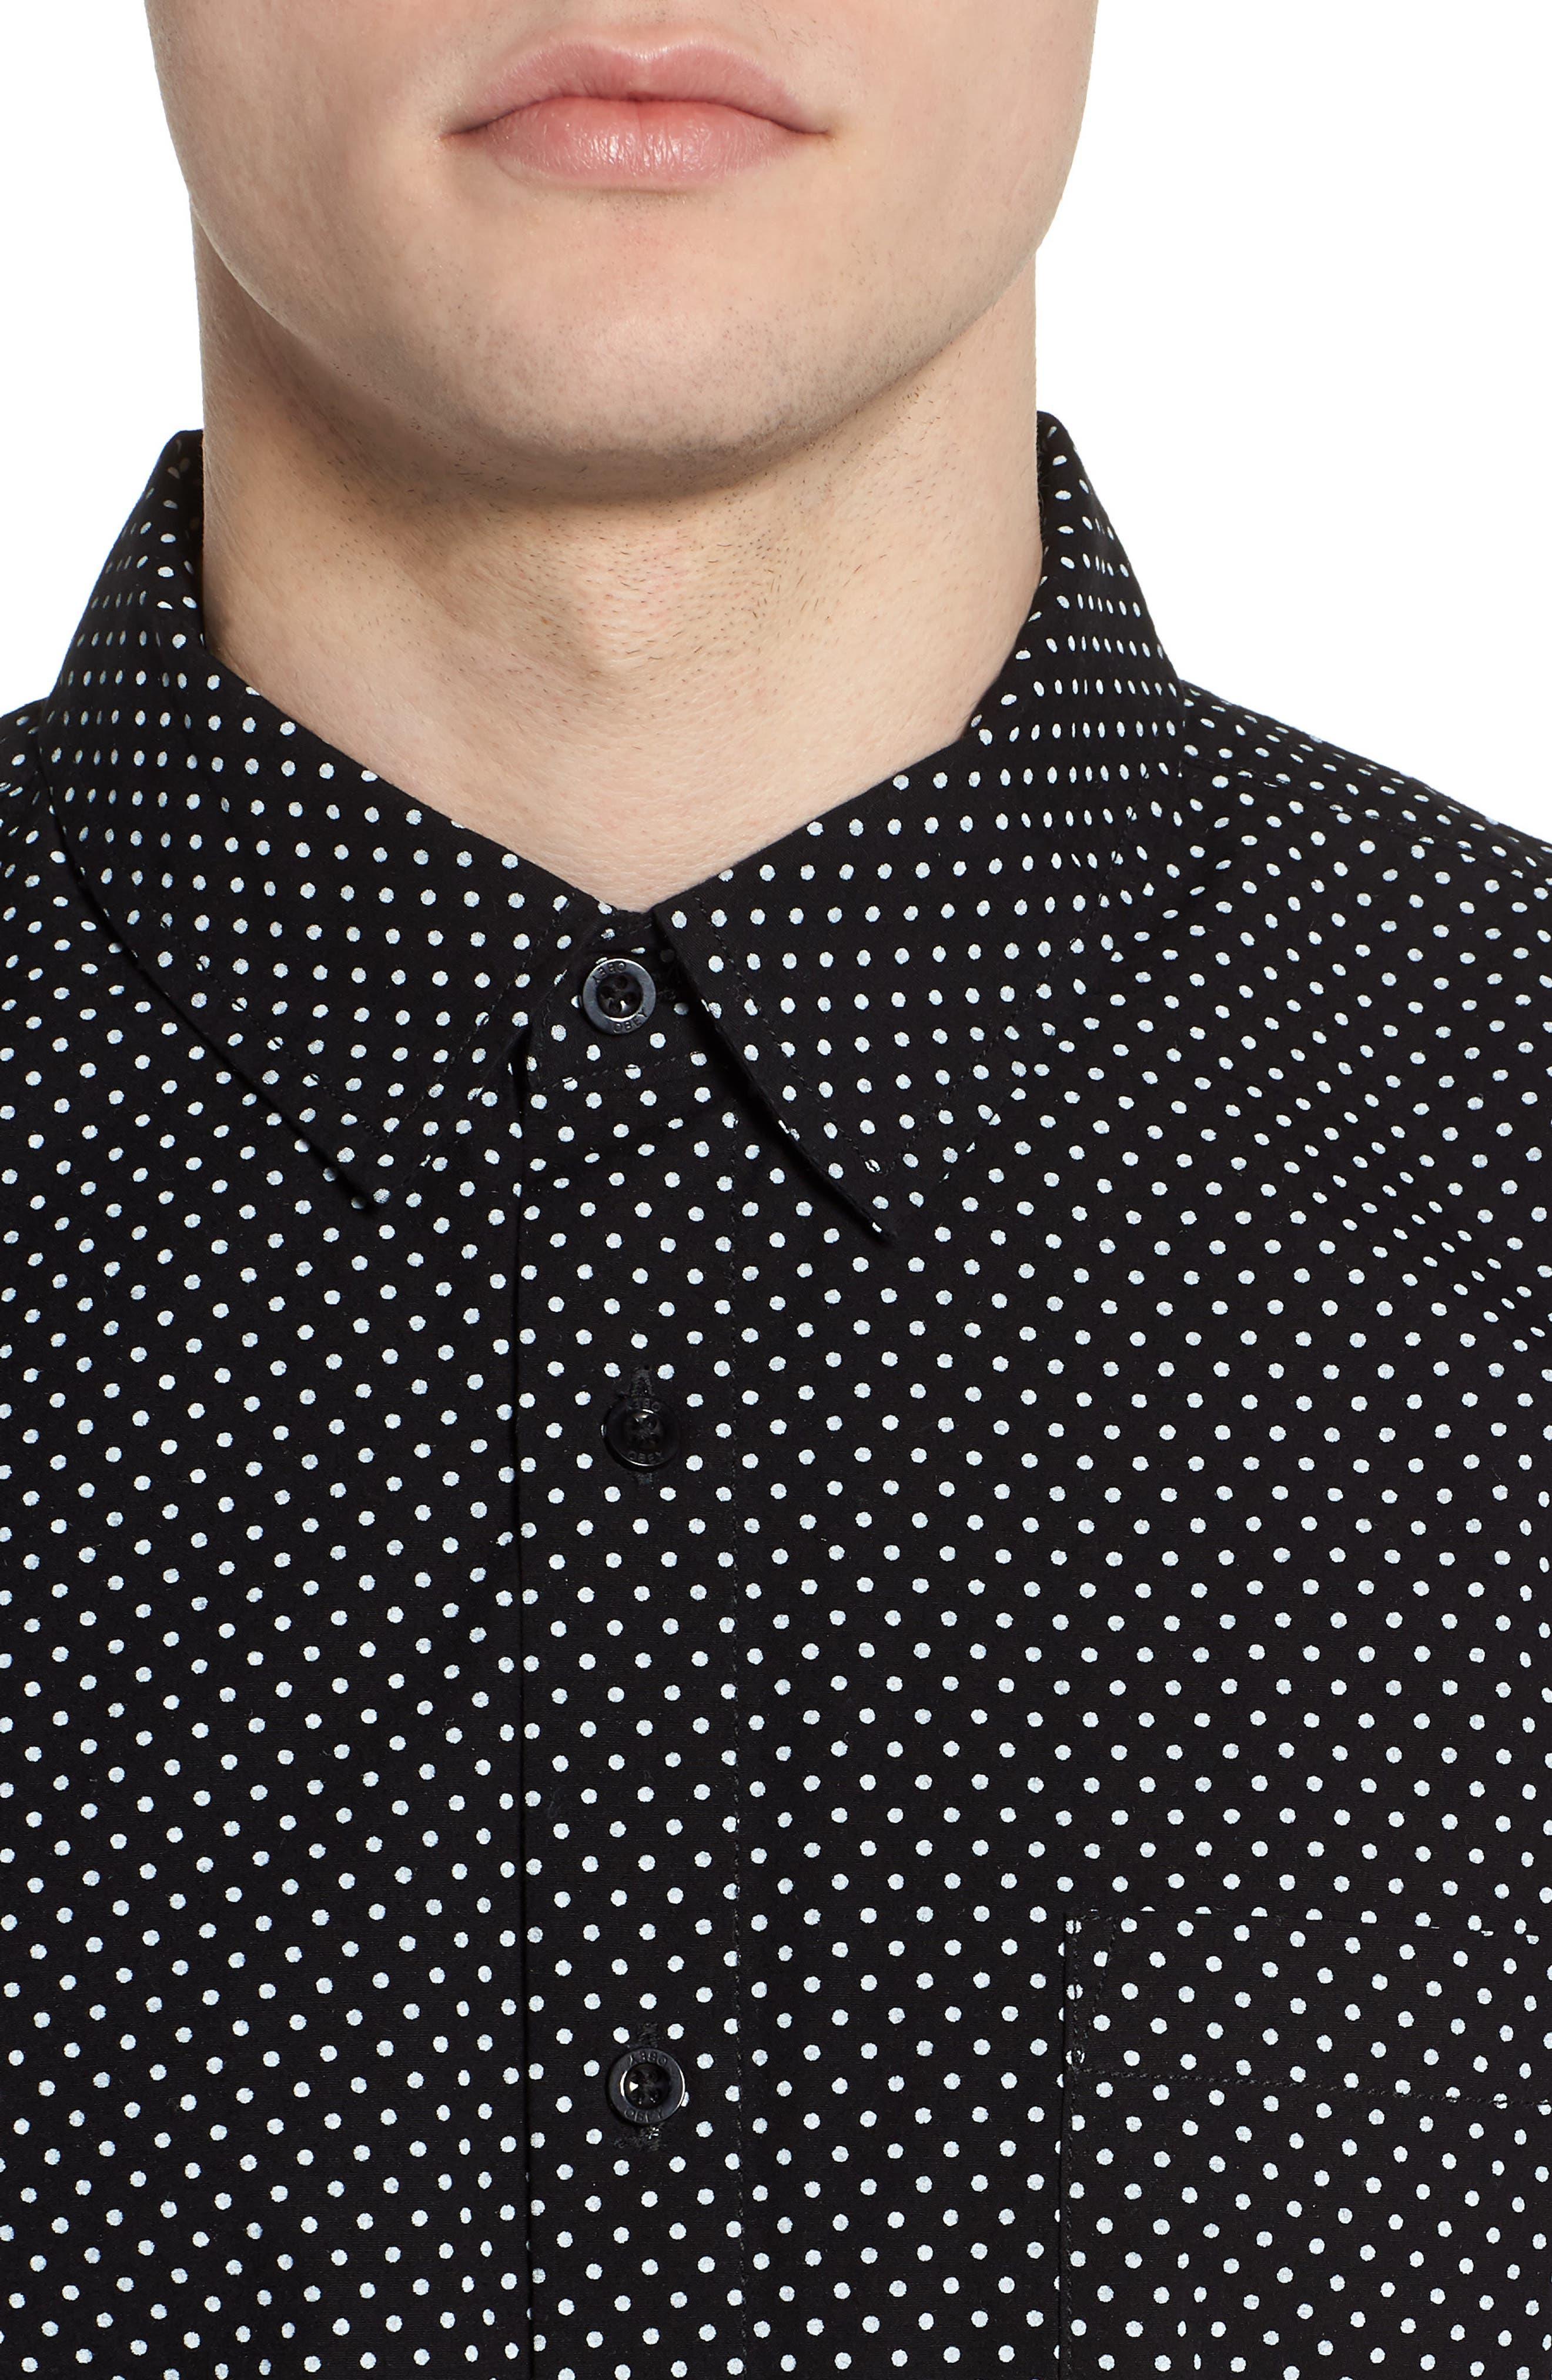 Brozwell Short Sleeve Shirt,                             Alternate thumbnail 4, color,                             001